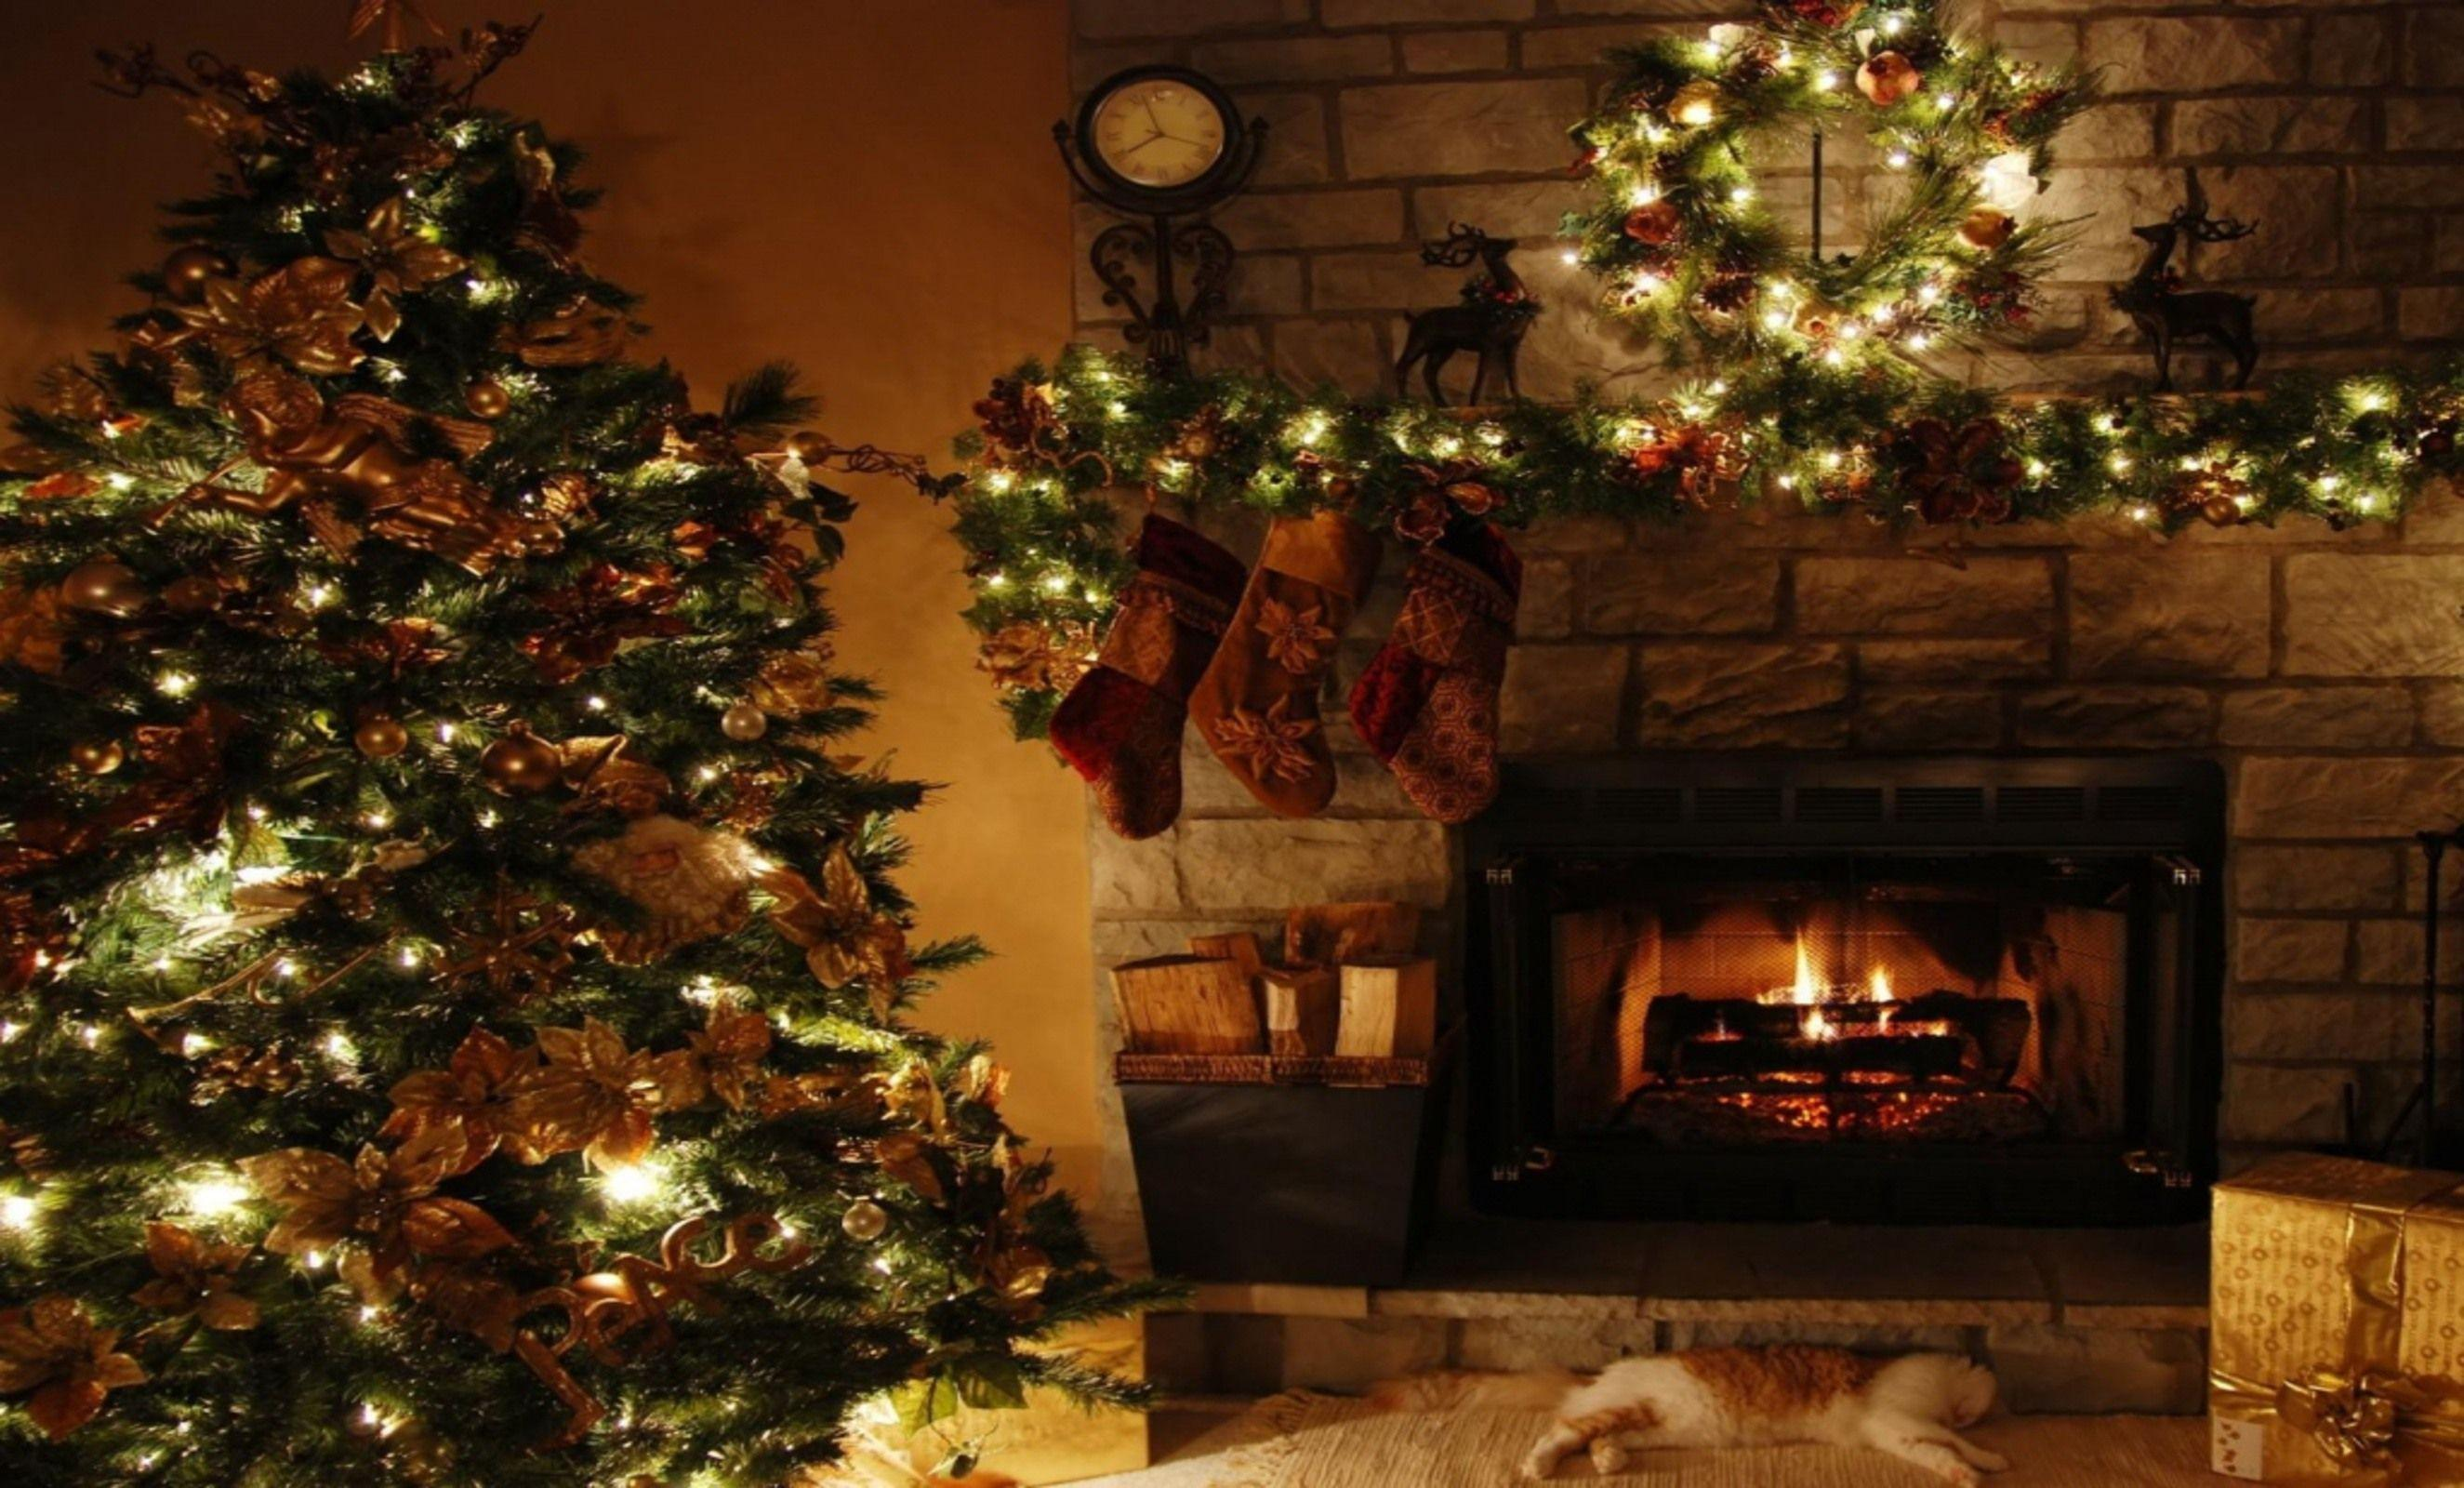 Christmas Fireplace Backgrounds 2650x1600